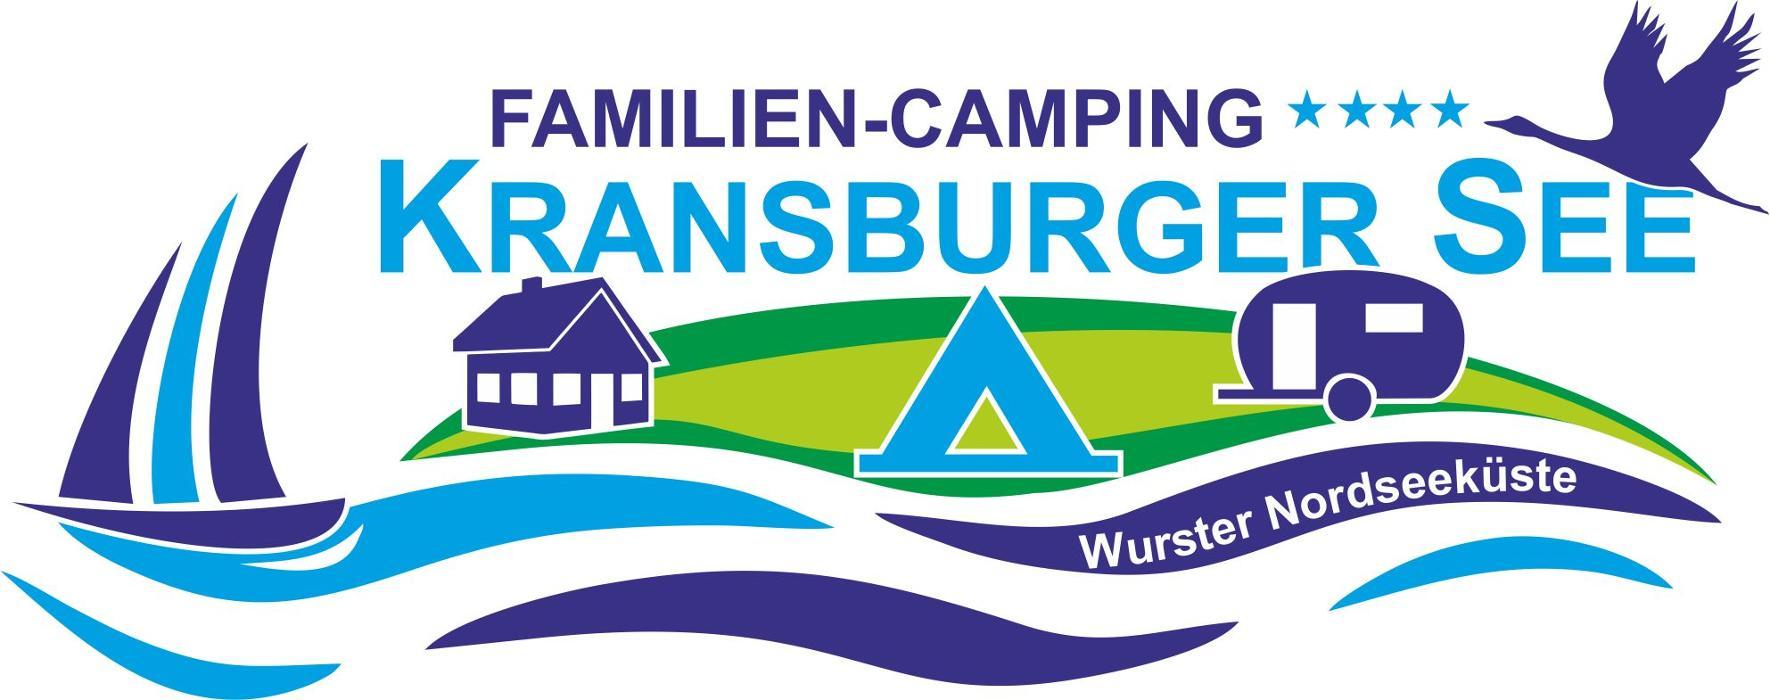 Logo von Familien-Camping Kransburger See